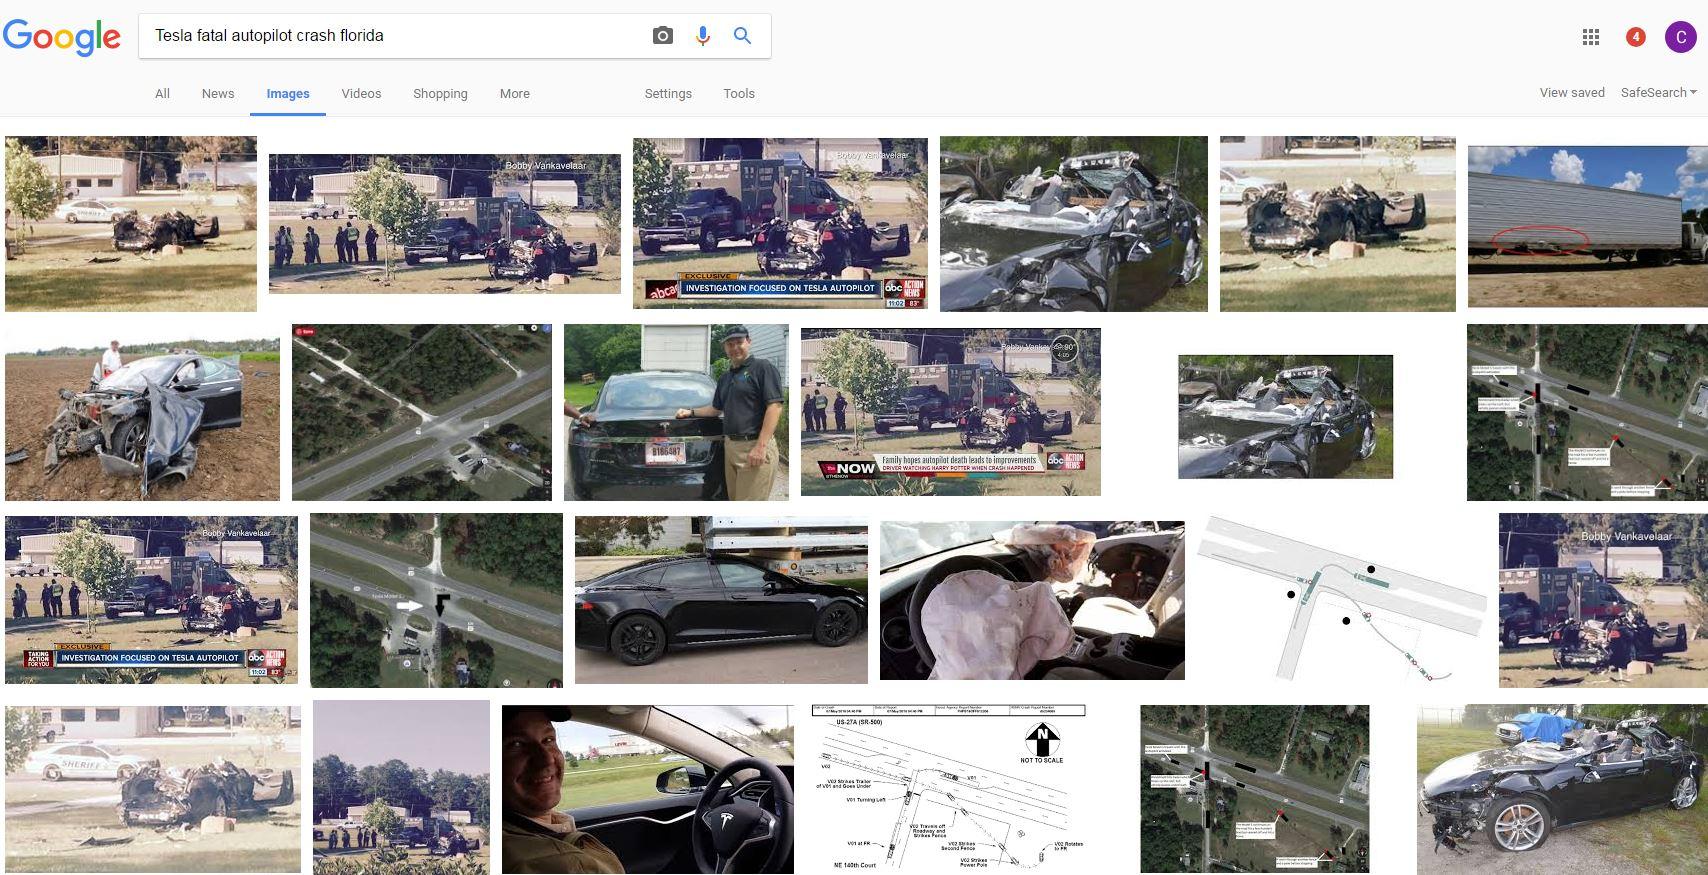 Cabrall - Fatal Tesla Autopilot Google image search